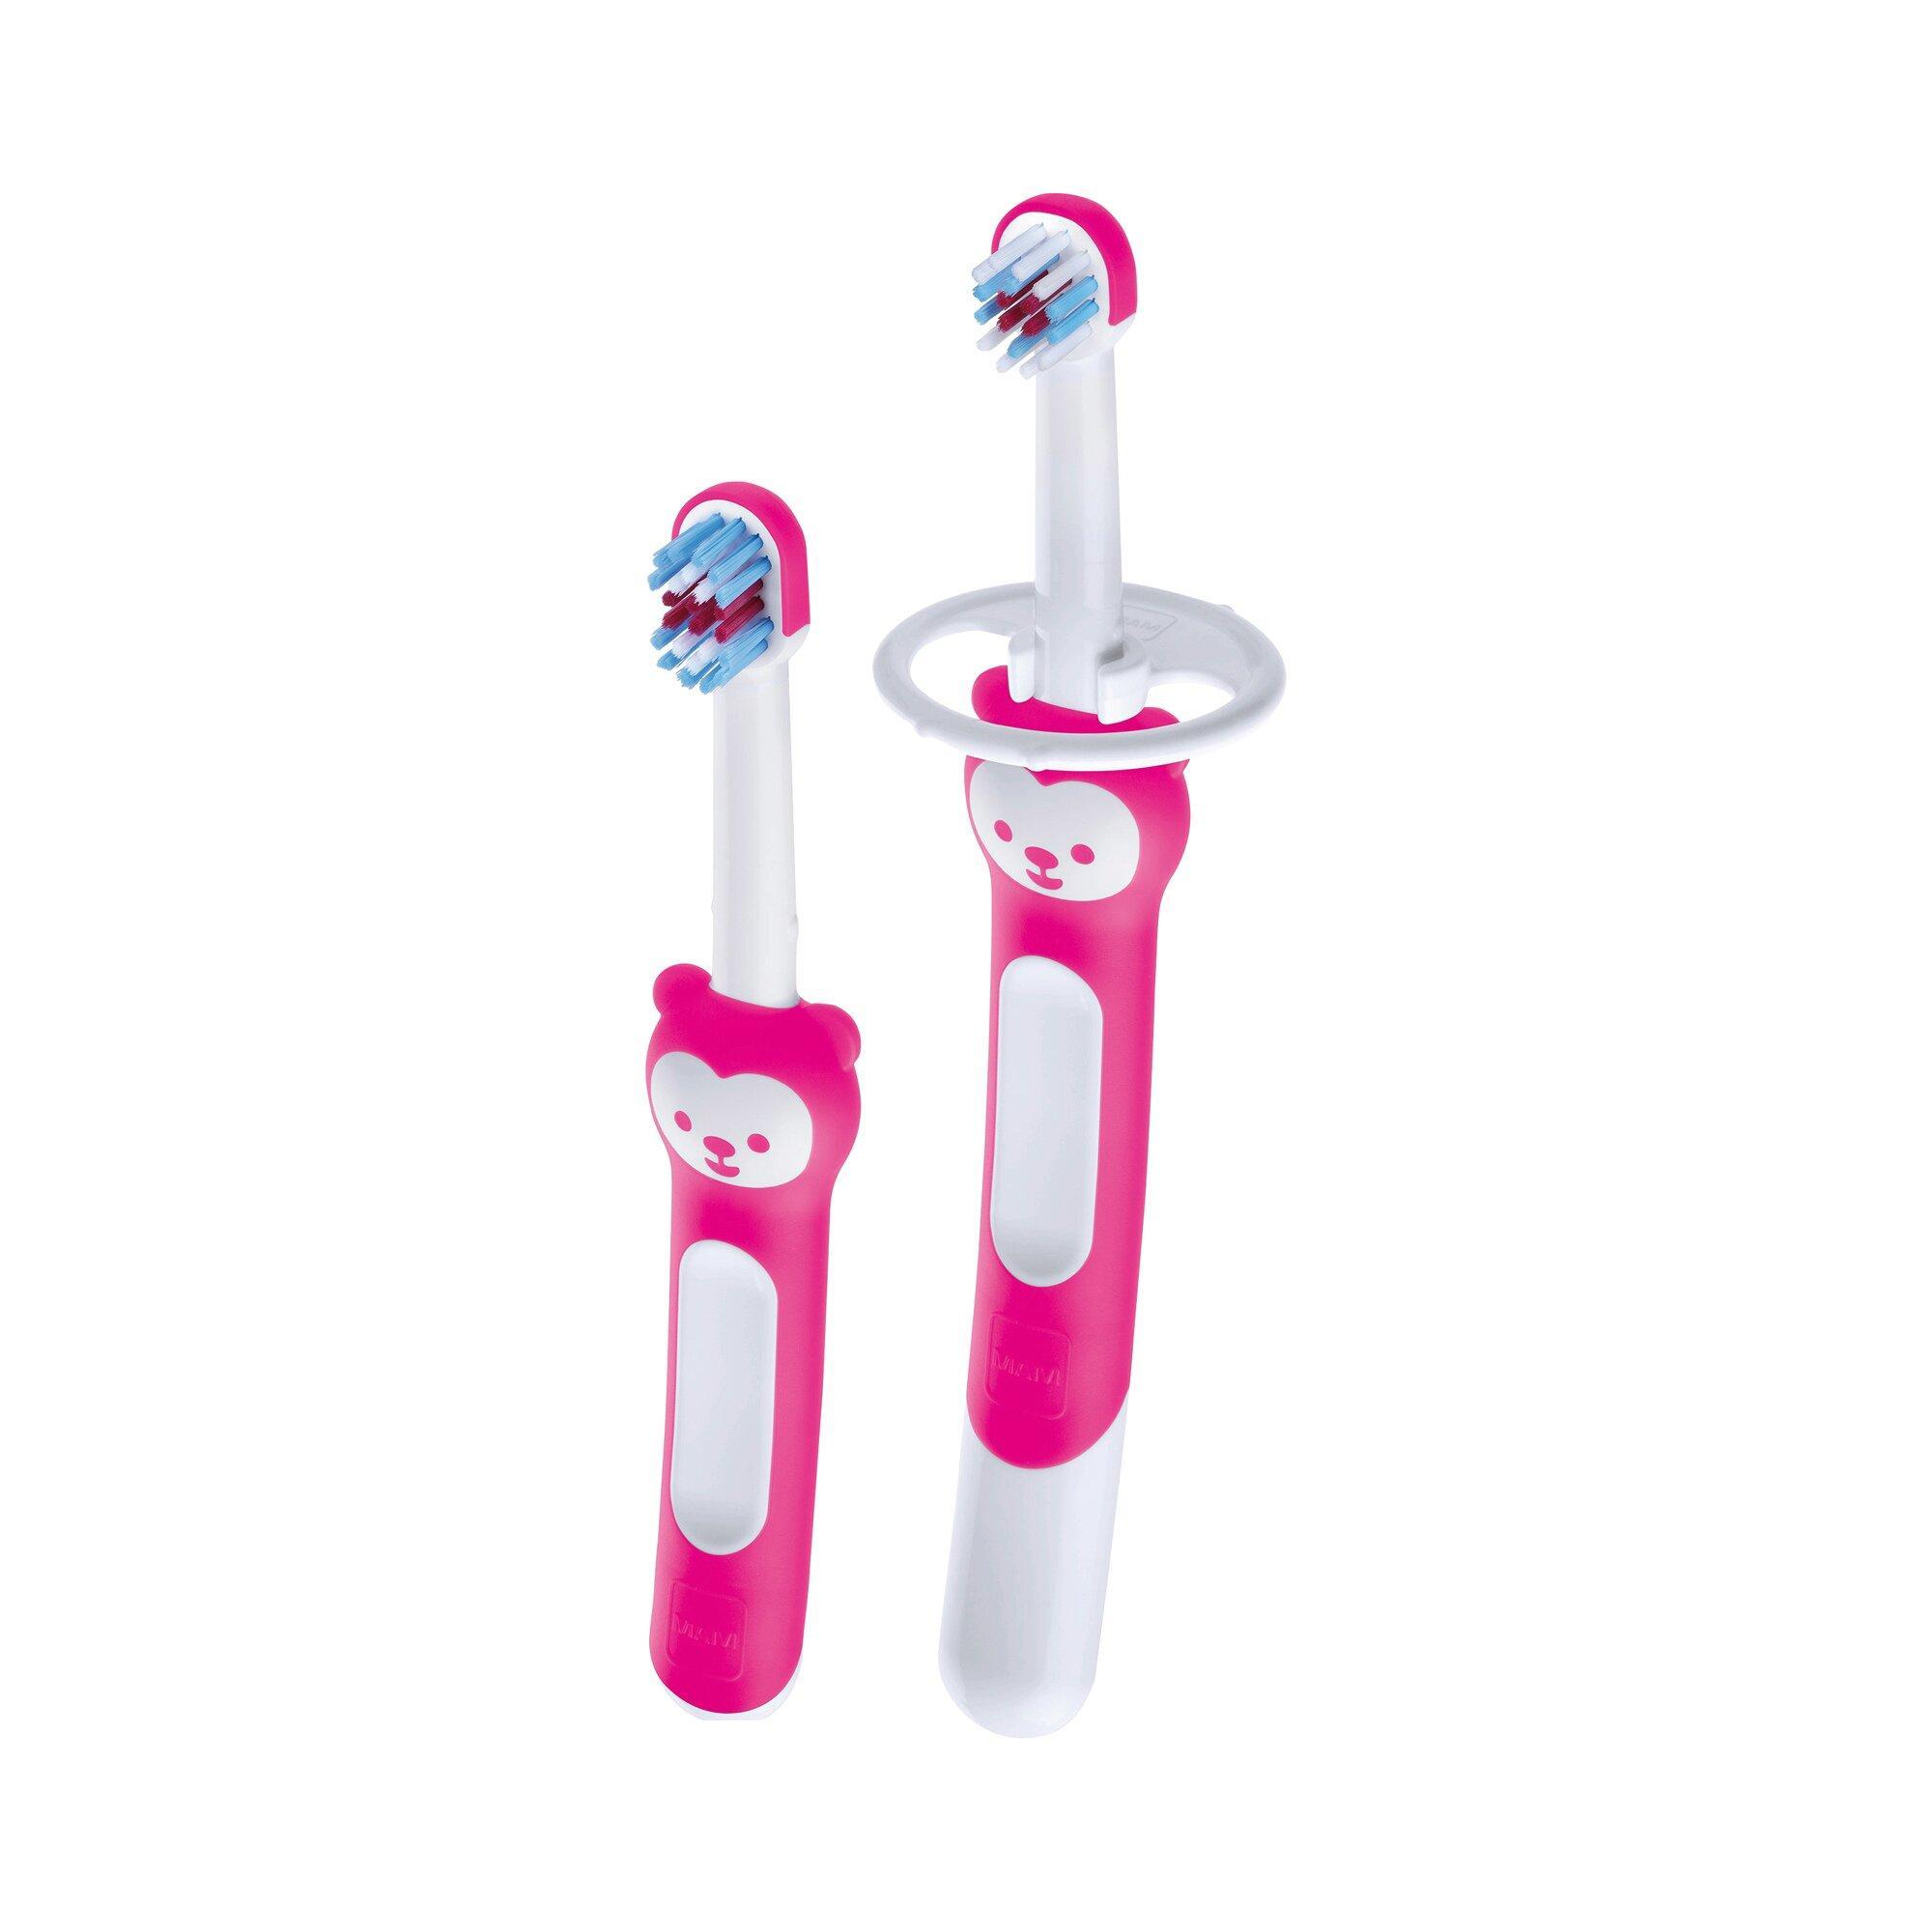 2er-Set Baby-Zahnbürsten